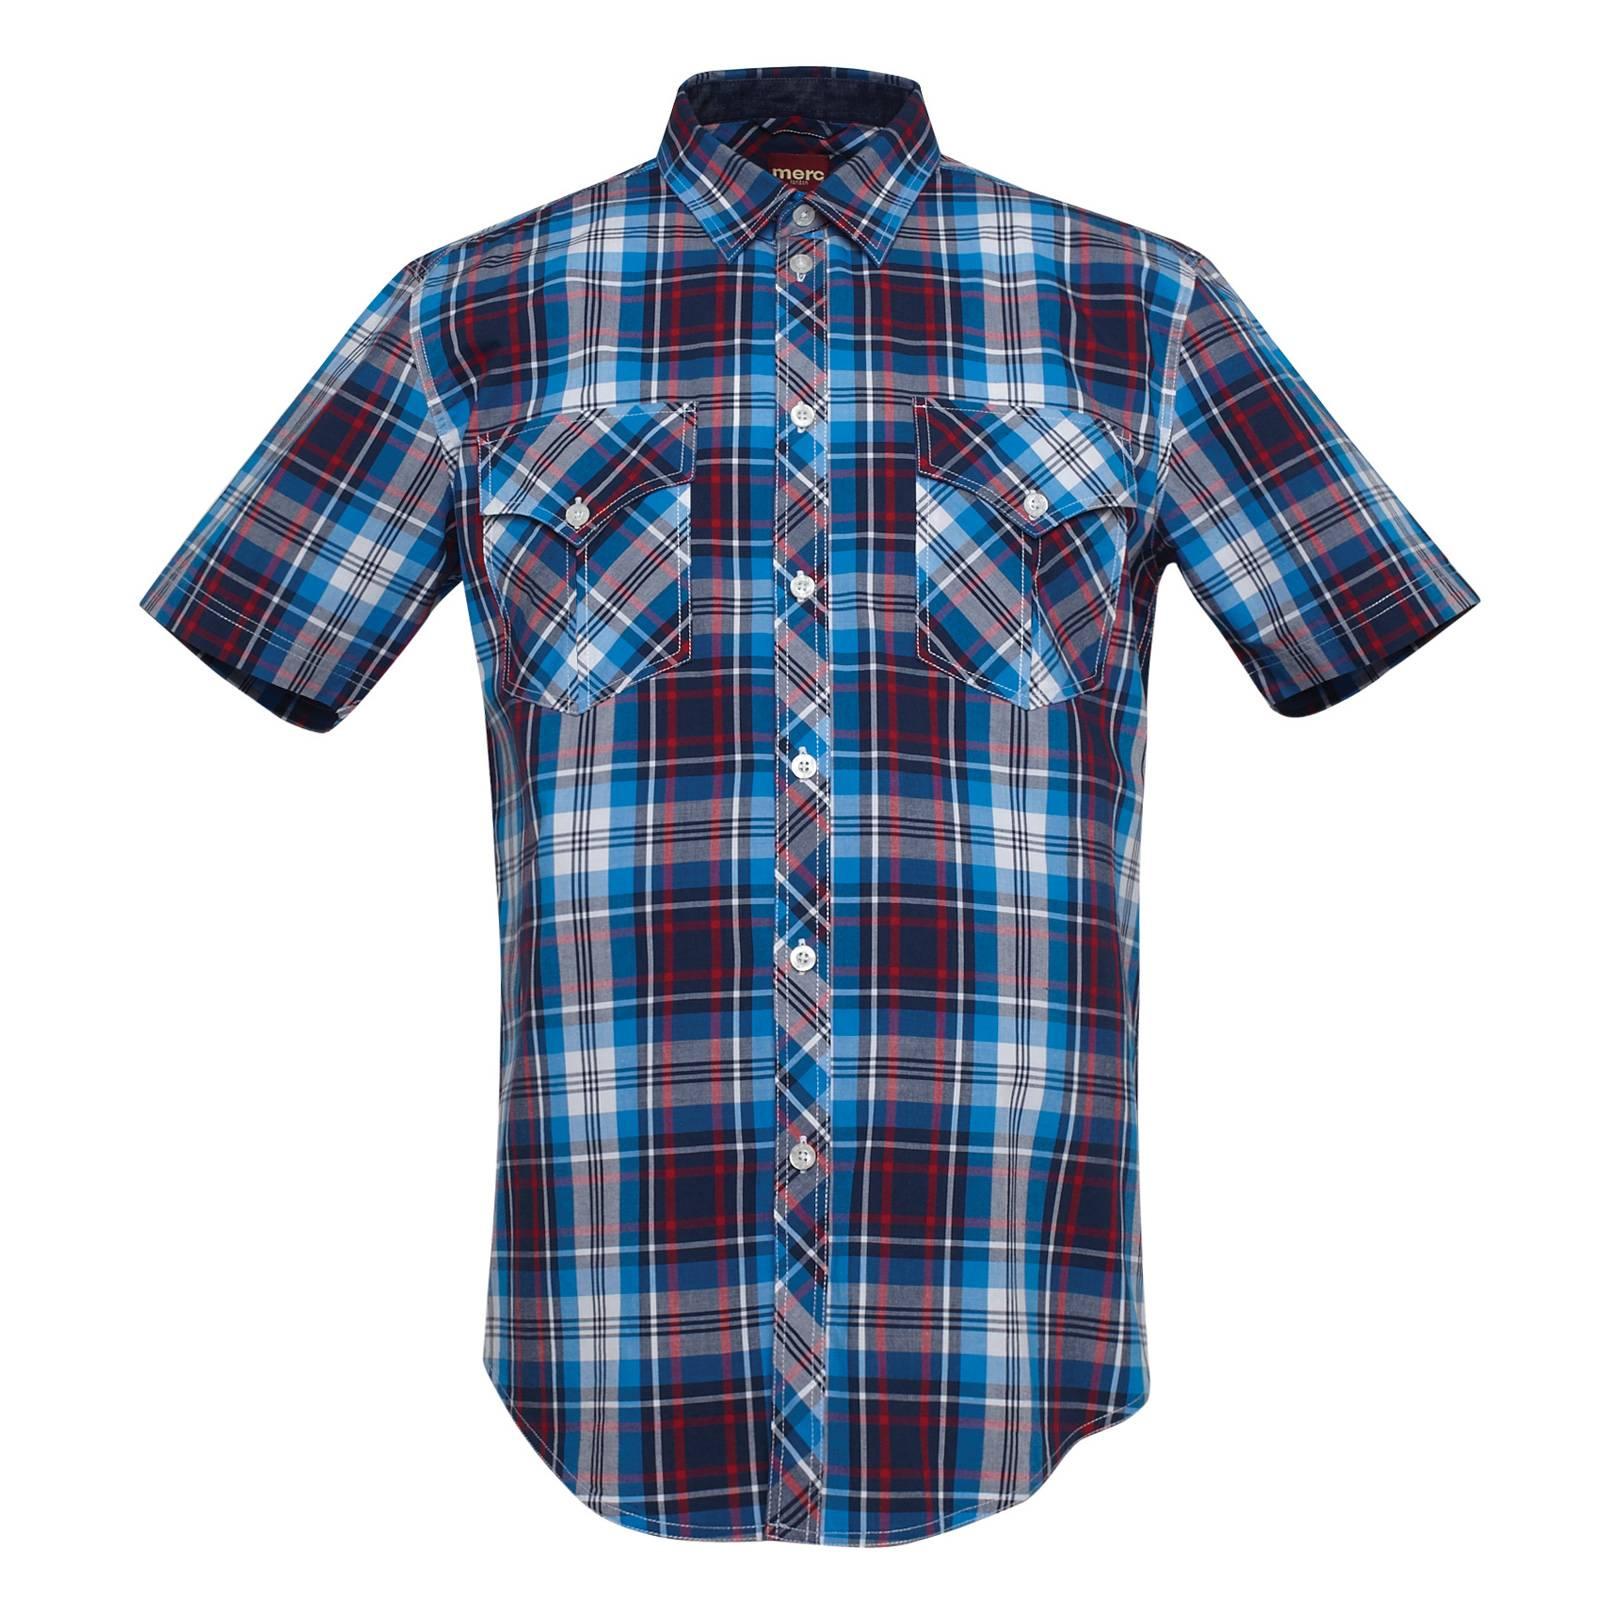 Рубашка Graham - Merc LondonРубашки<br><br><br>Артикул: 1512112<br>Материал: 100% хлопок<br>Цвет: синий<br>Пол: Мужской